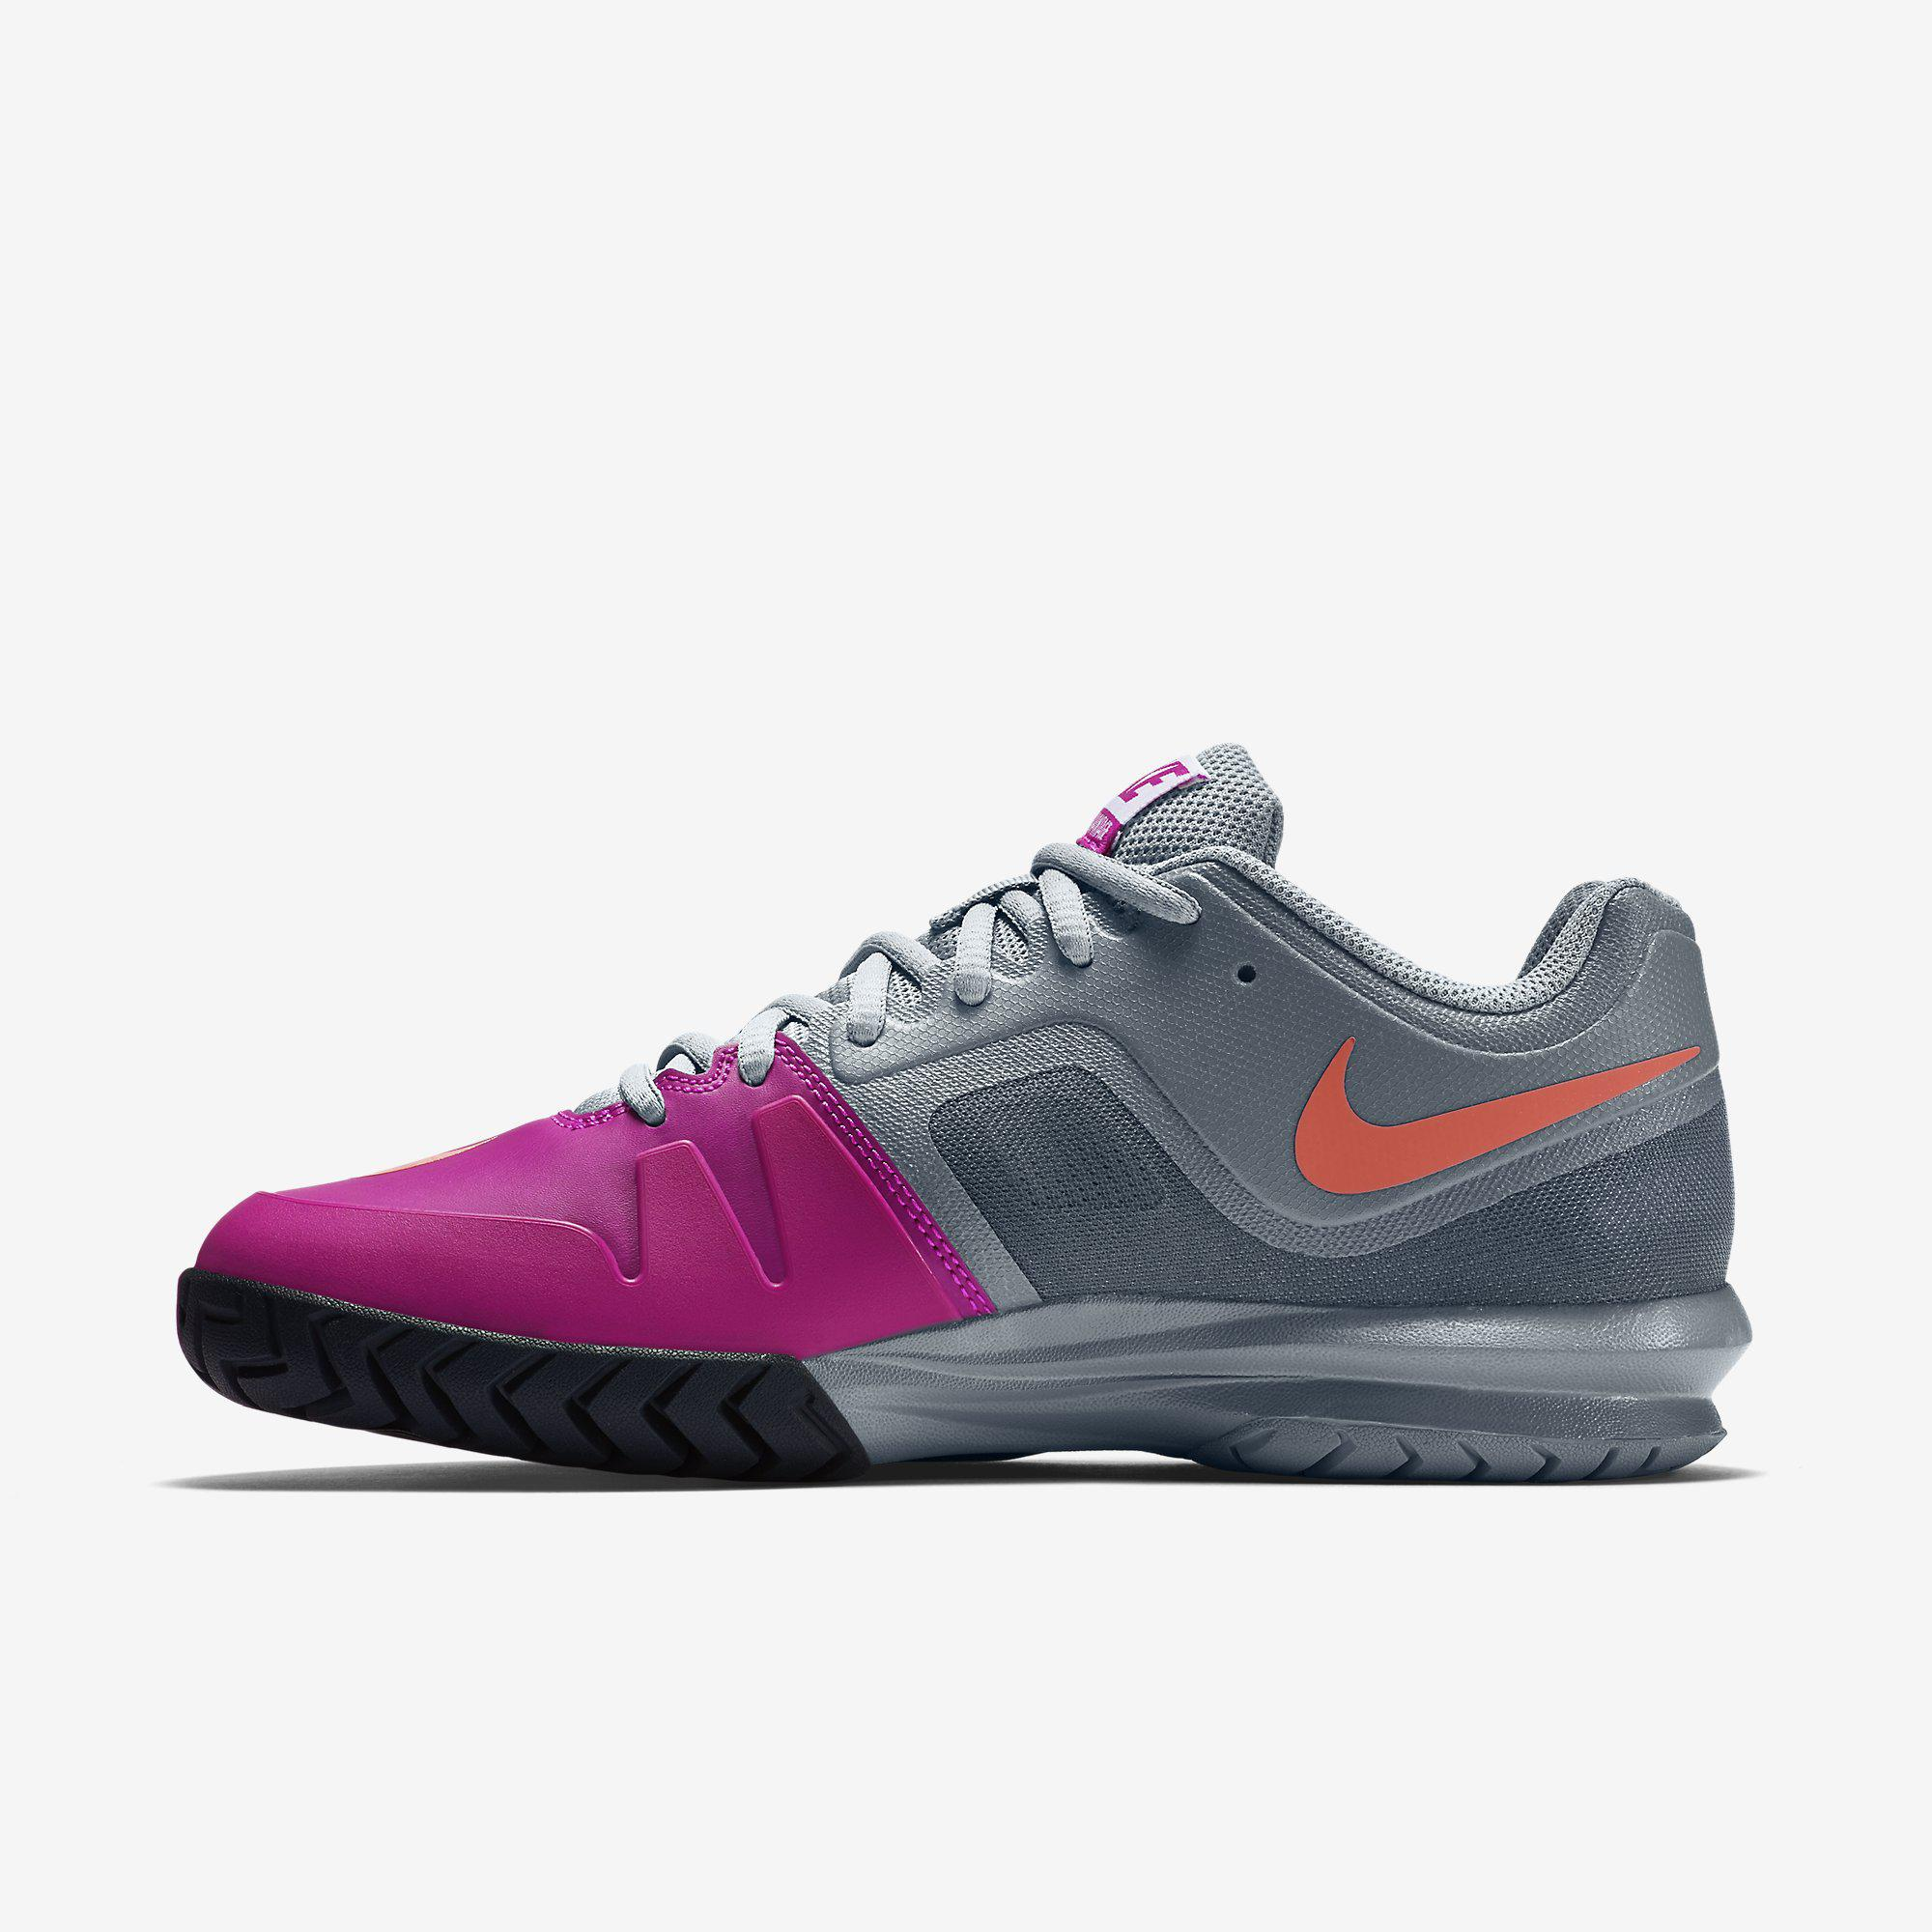 Nike Ballistec Advantage Tennis Shoes